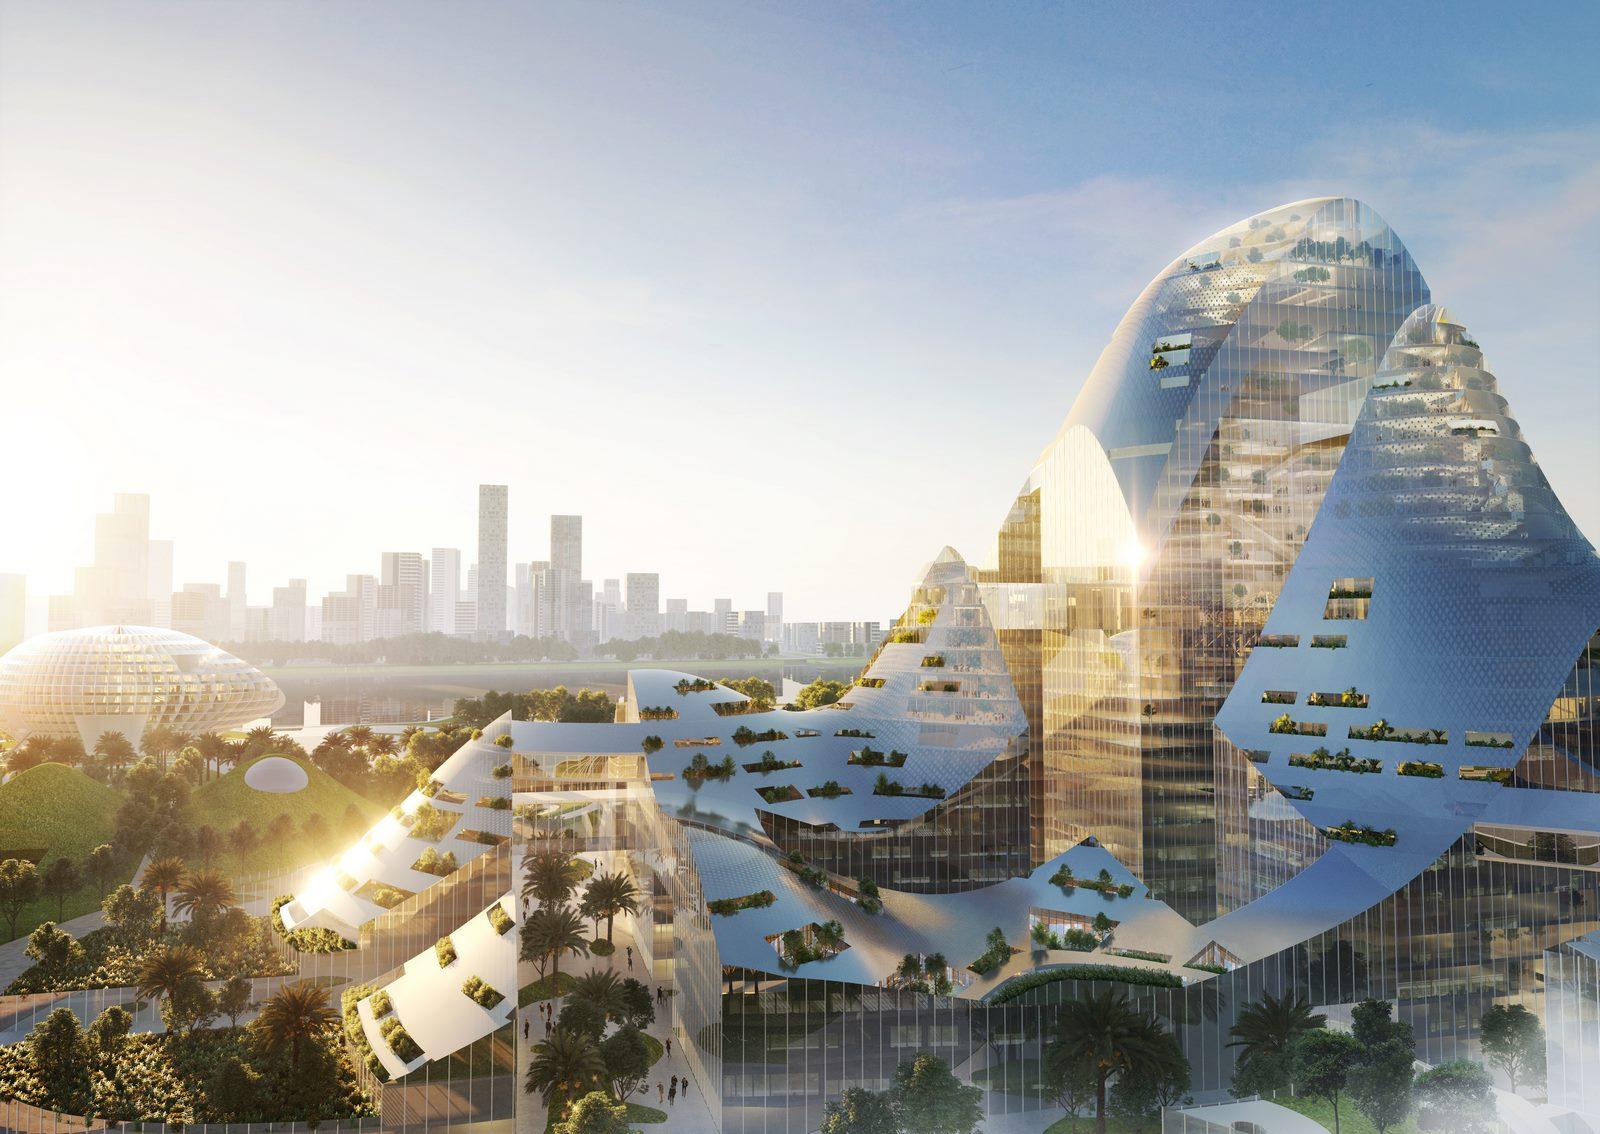 Ciudad inteligente - MVRDV